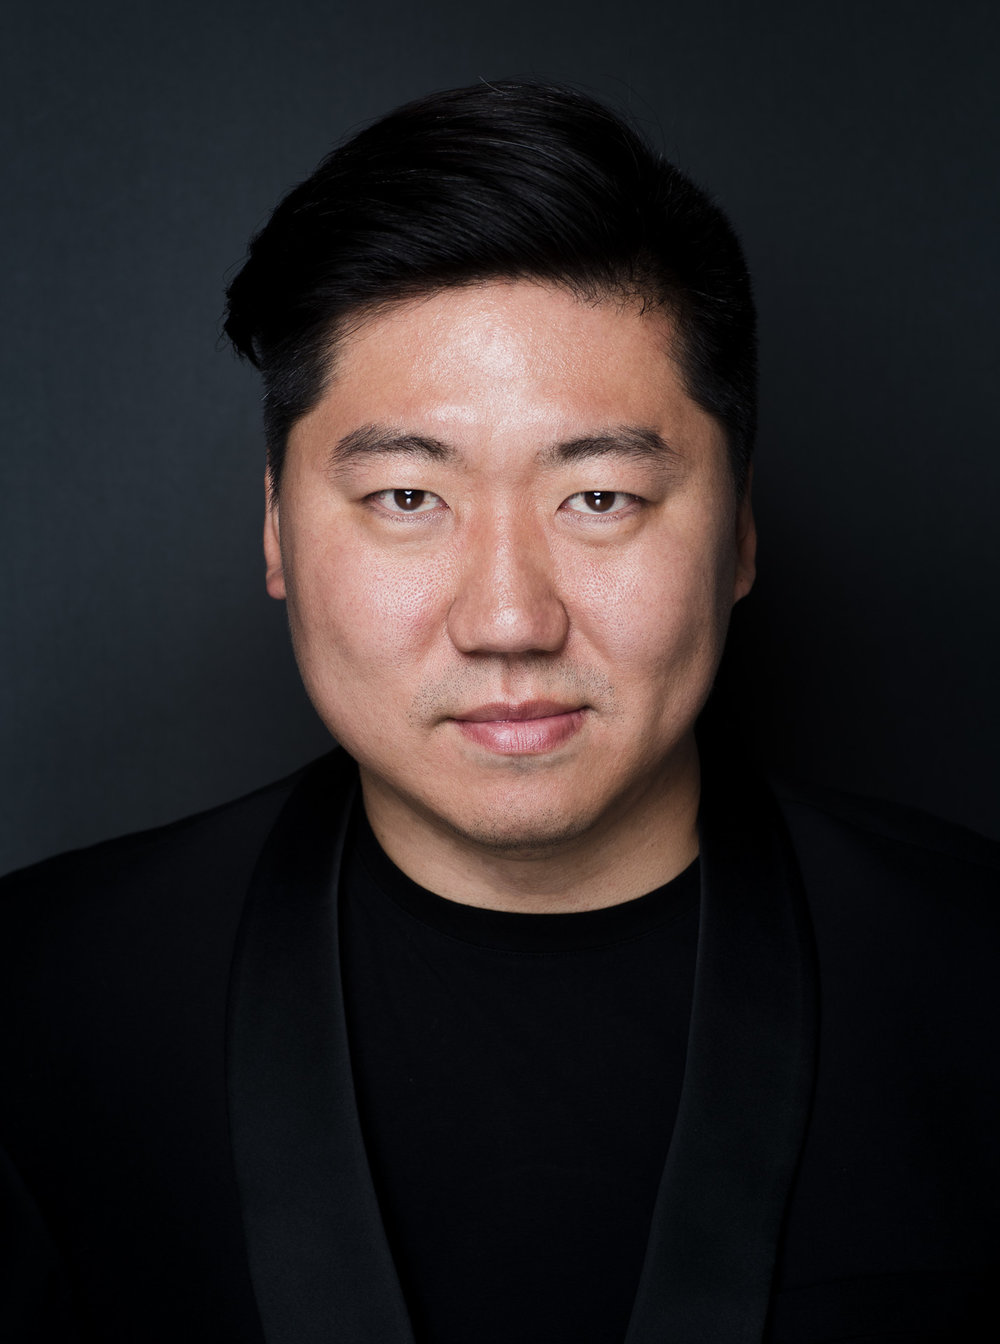 SeungHyeon Baek  , baritone